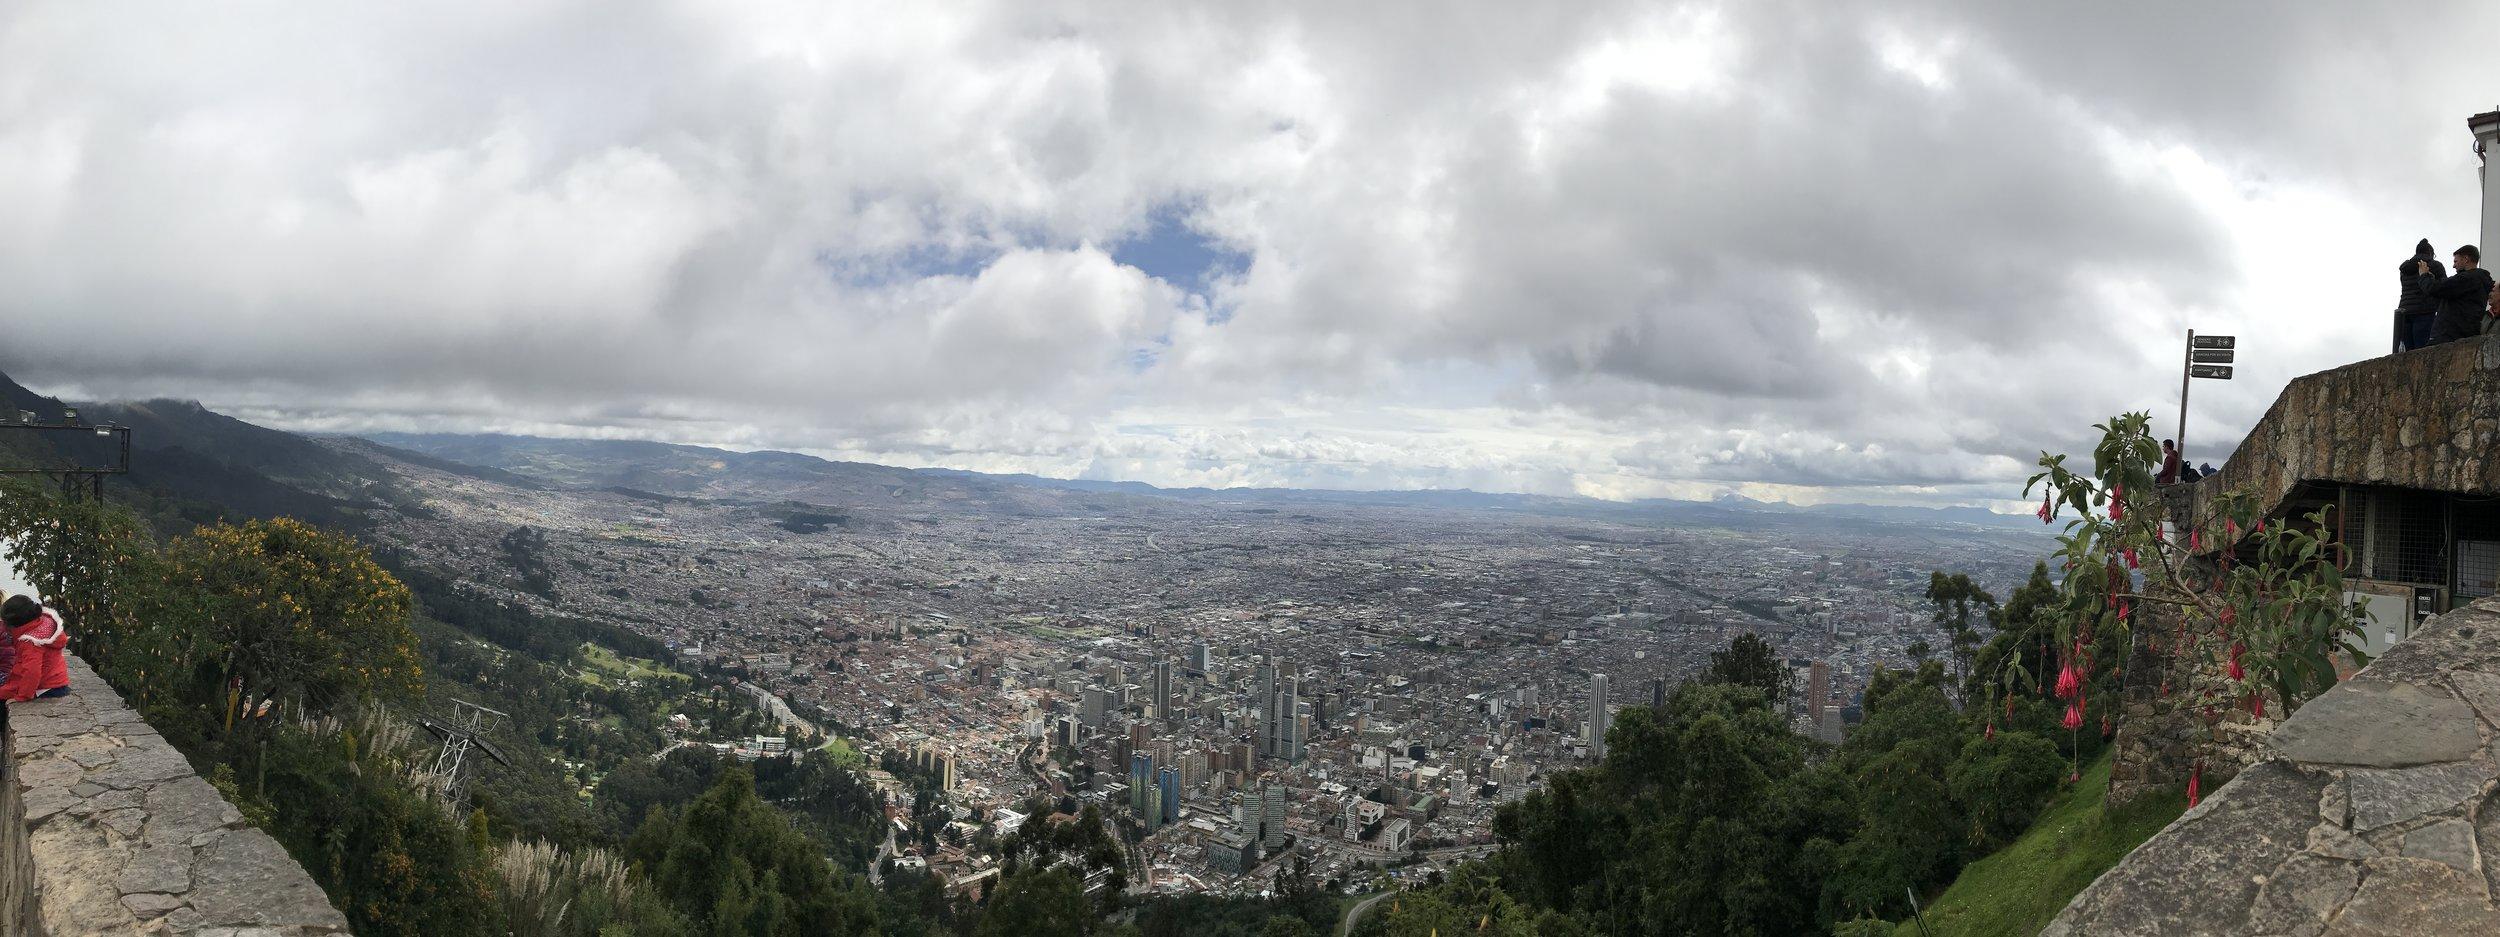 The view of Bogotà atop Montserrate